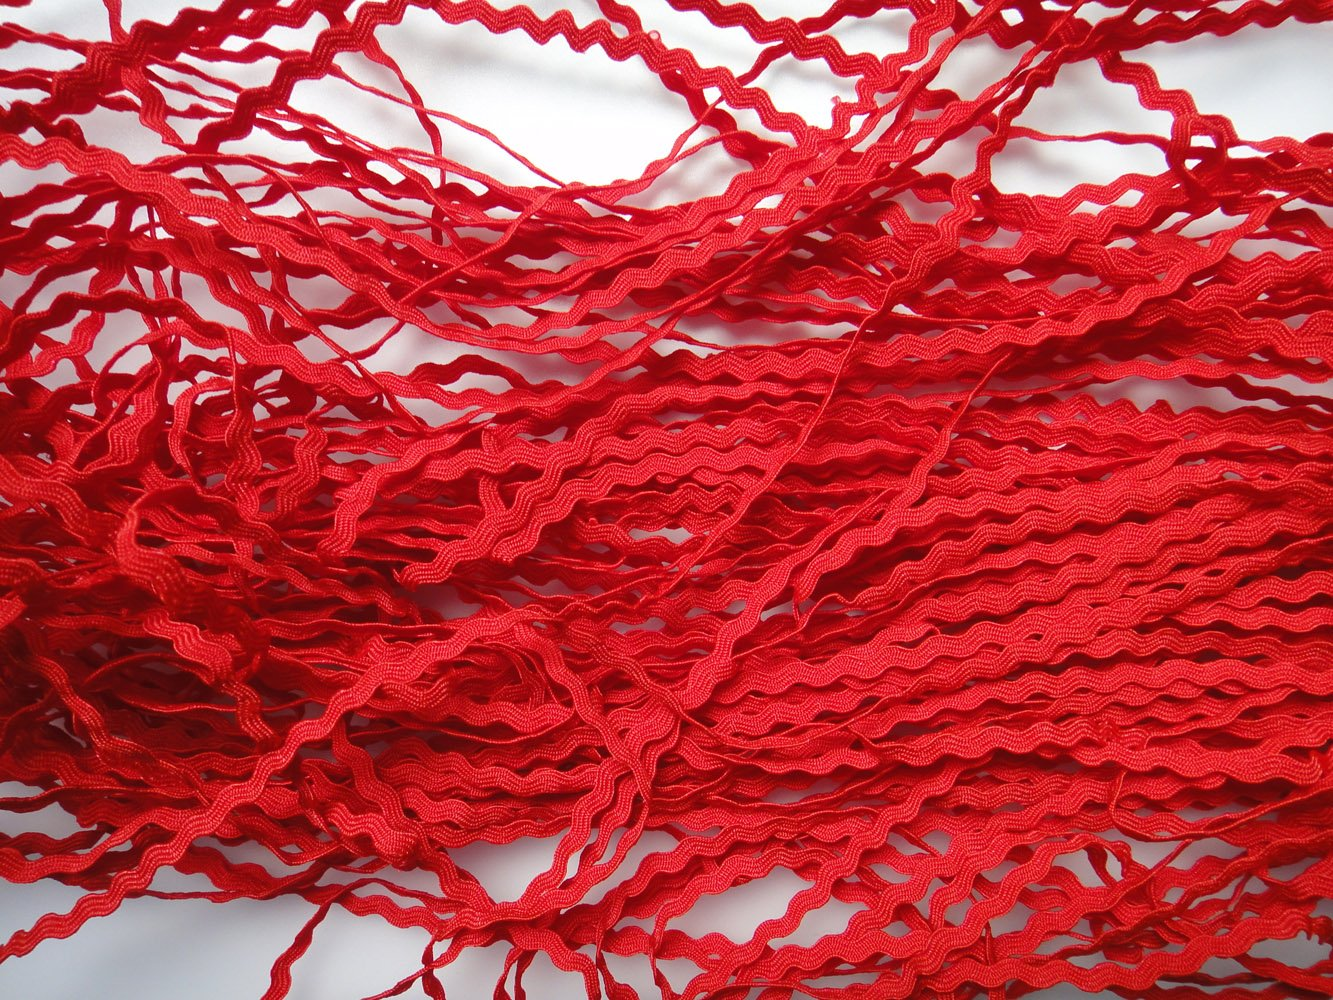 Lyracces Wholesale Lots 50yards Mini Woven Zigzag Rick Rack Ribbon Ric Rac Trims Scrapbooking Dressmaking 5mm, White